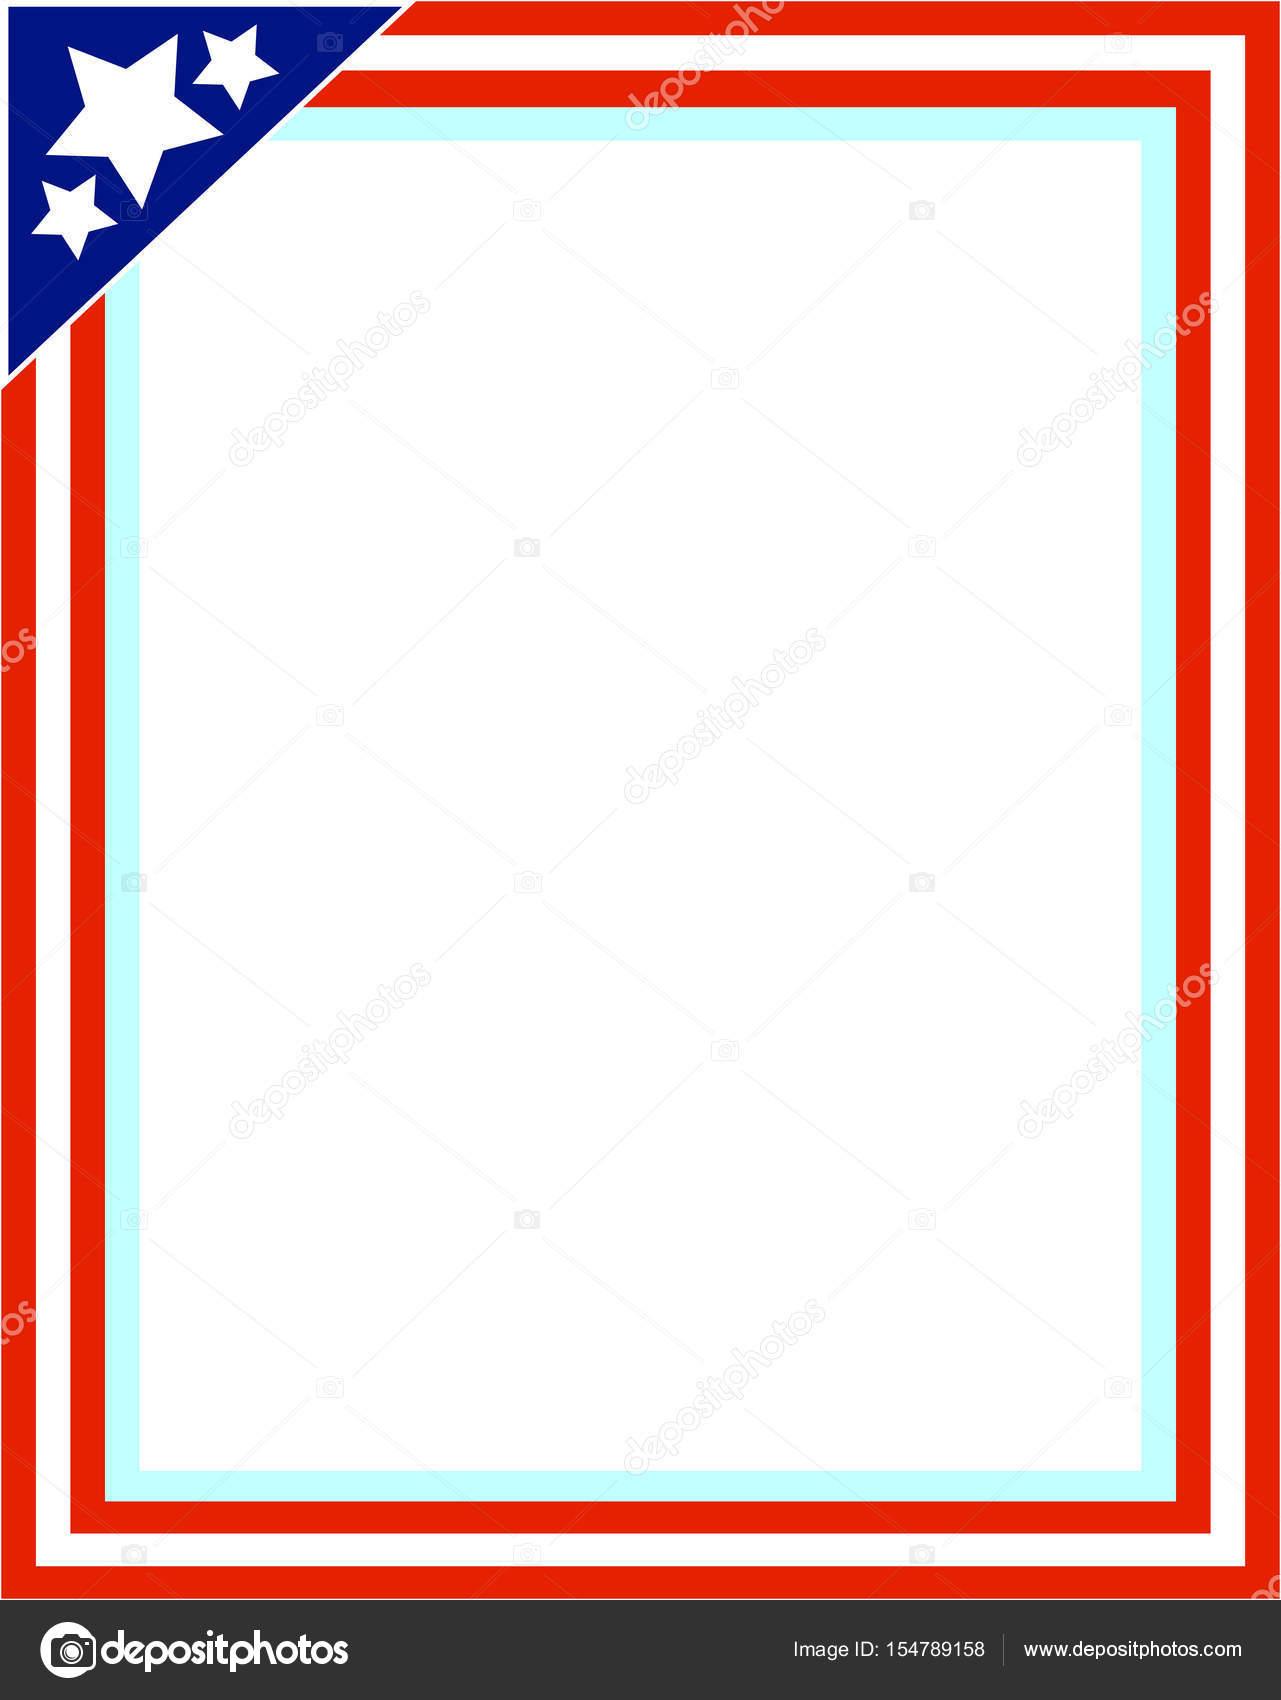 USA Flagge Bilderrahmen für Foto — Stockvektor © skef1964 #154789158